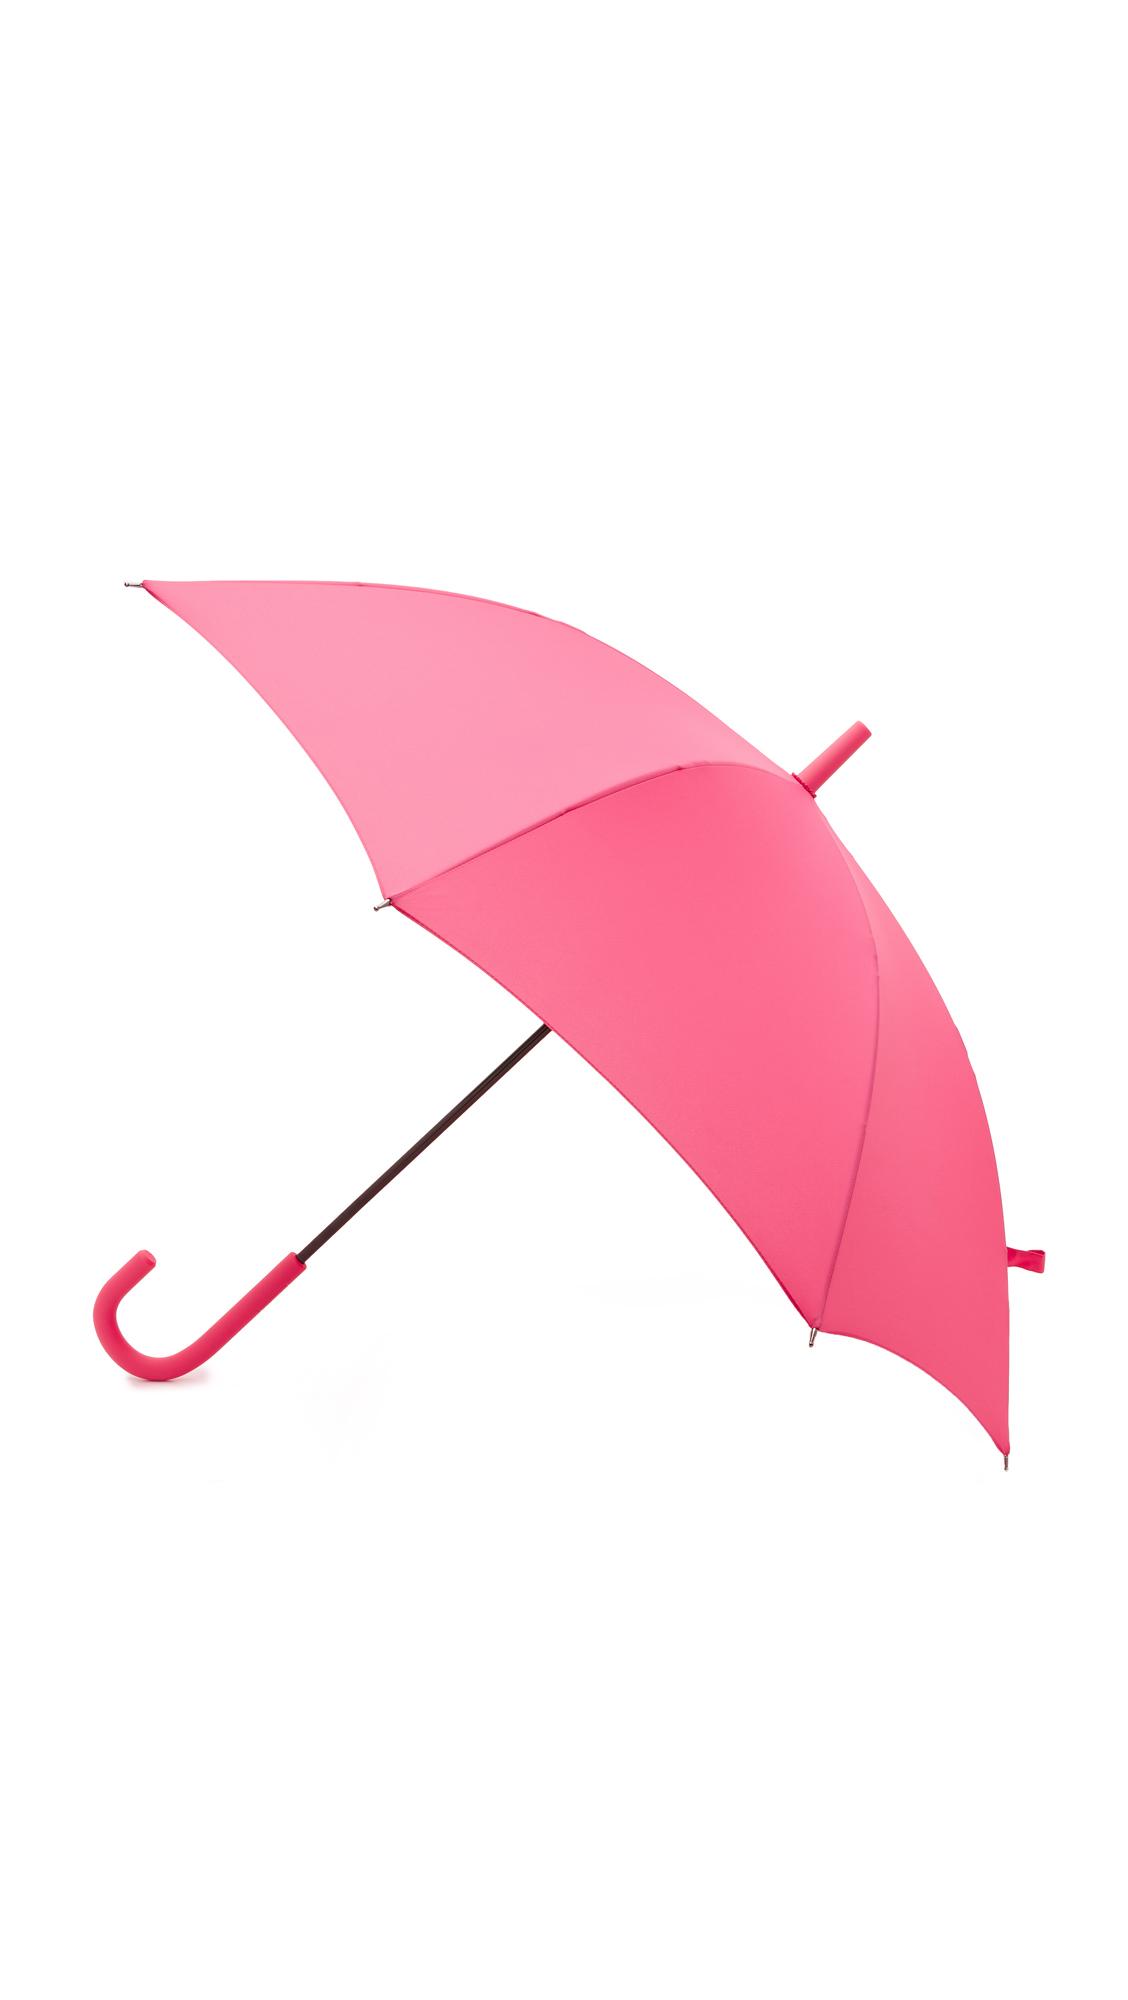 ... Original Walker Umbrella - Black in Red (Raspberry Sorbet) | Lyst